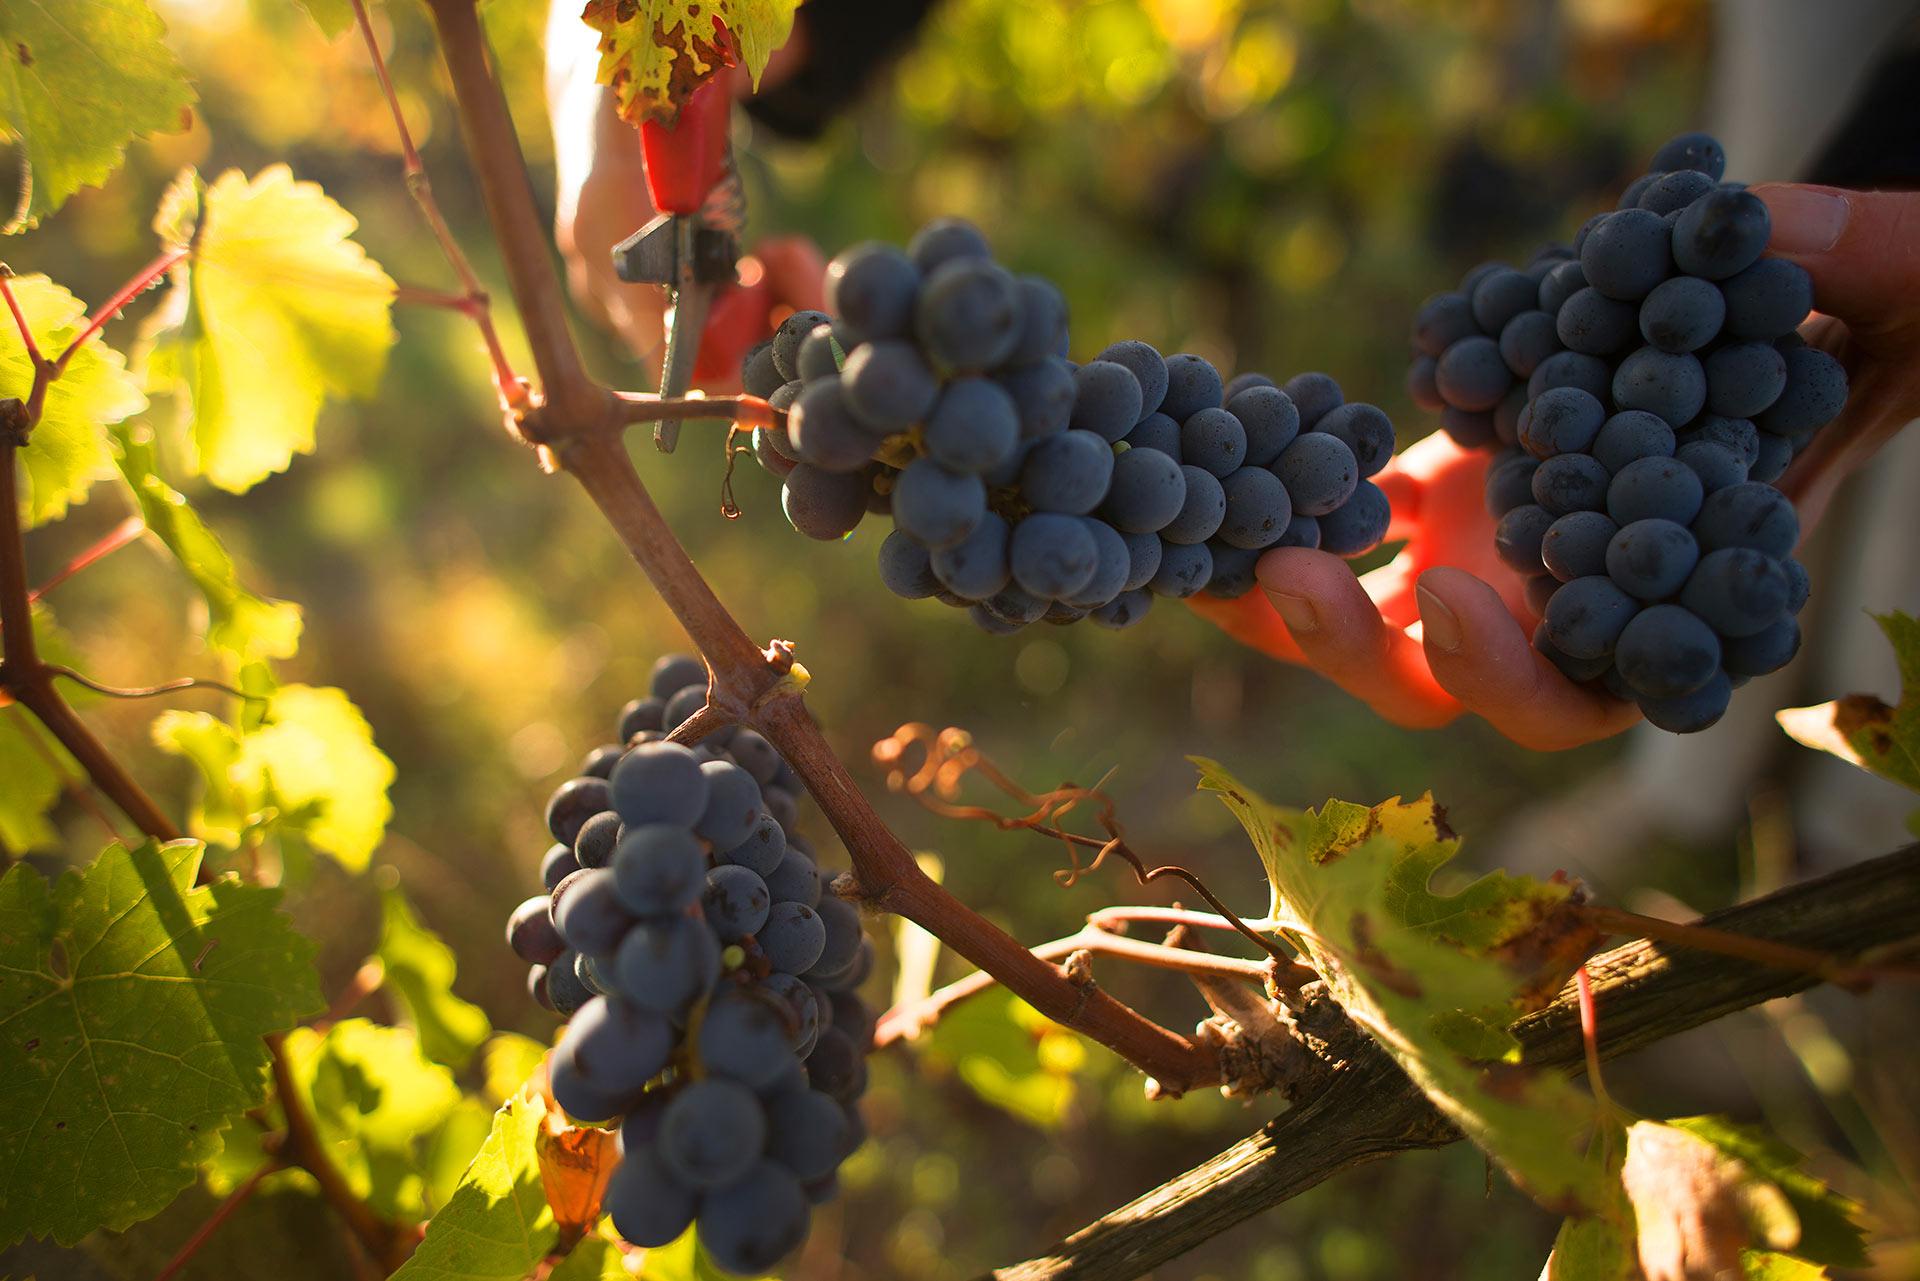 Art Russe Saint-Emilion Grand Cru is presented on the British wine market